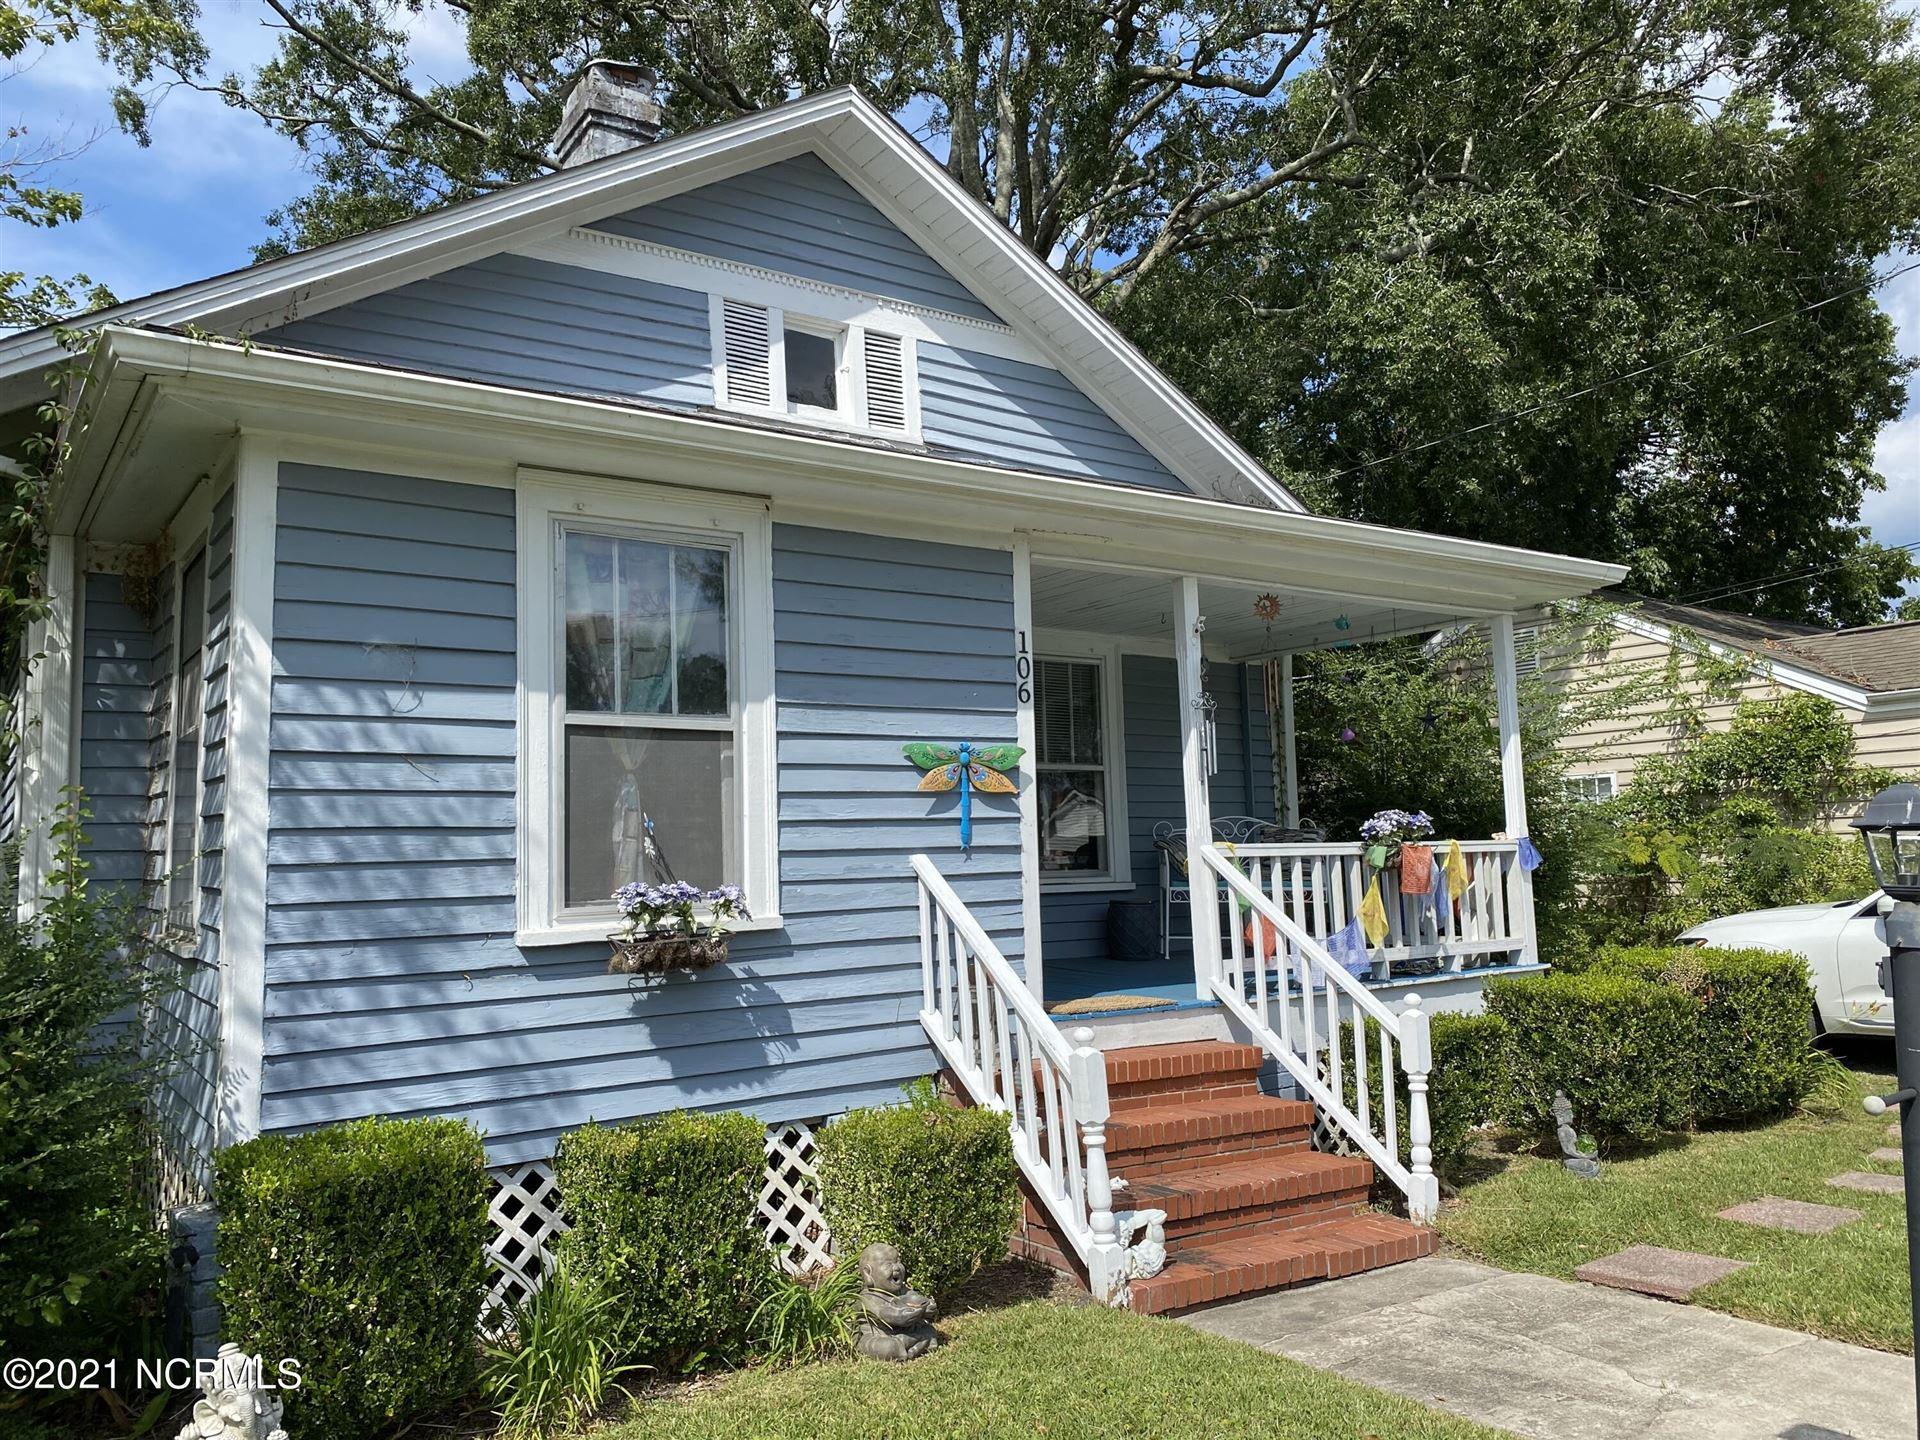 Photo of 106 W Bridgers Street, Burgaw, NC 28425 (MLS # 100291362)